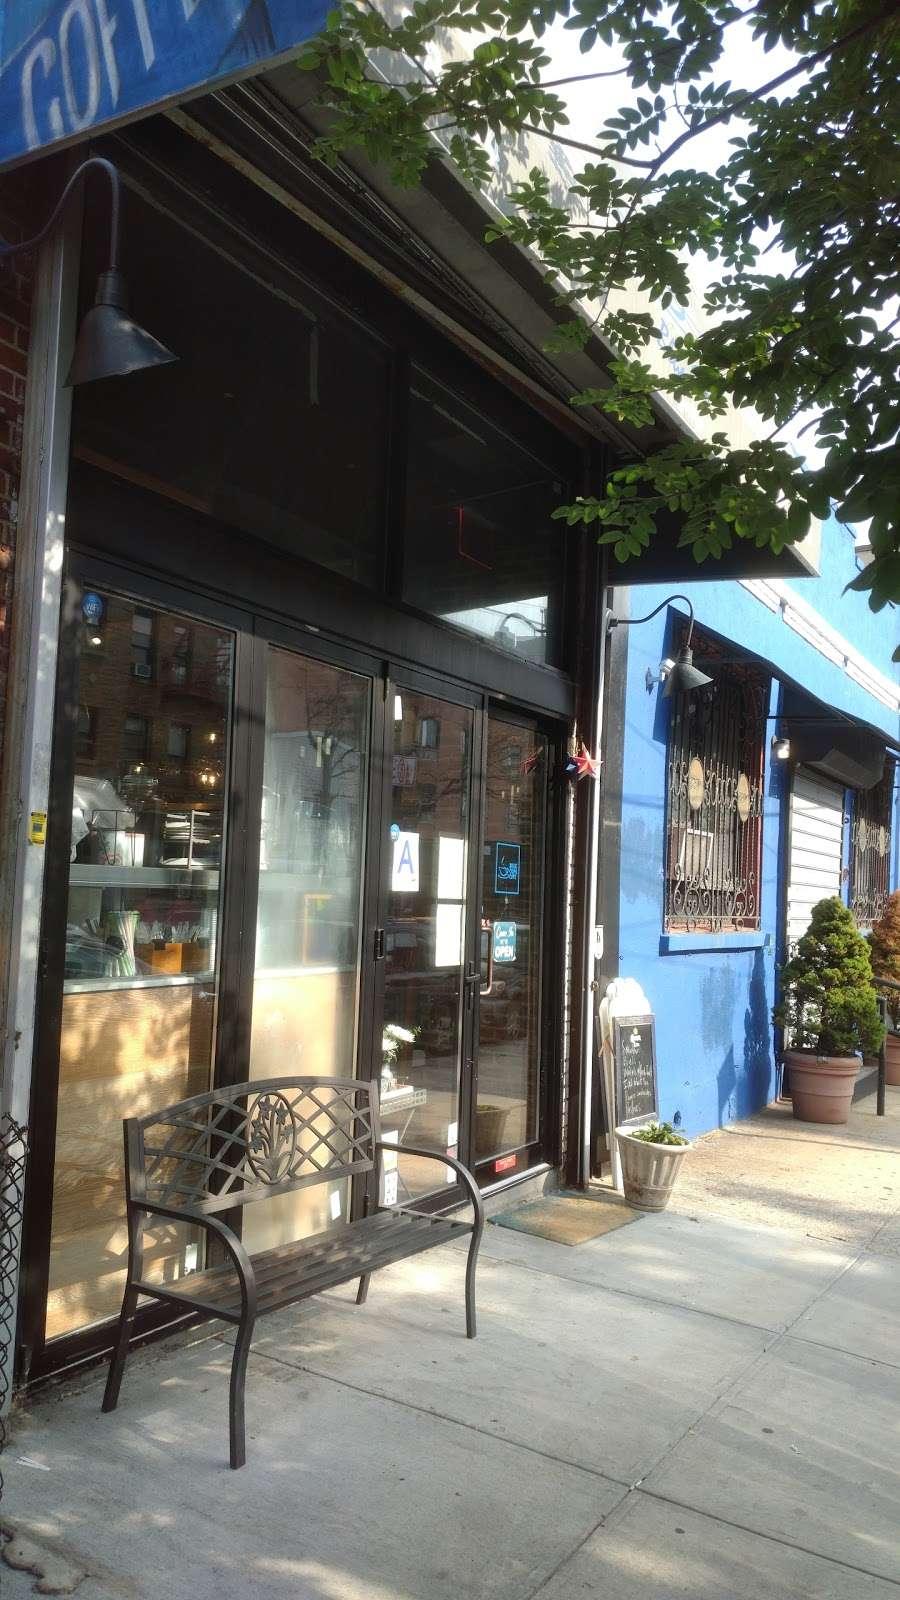 Blue Cups - cafe  | Photo 3 of 10 | Address: 38-4 61st St, Woodside, NY 11377, USA | Phone: (917) 832-6940